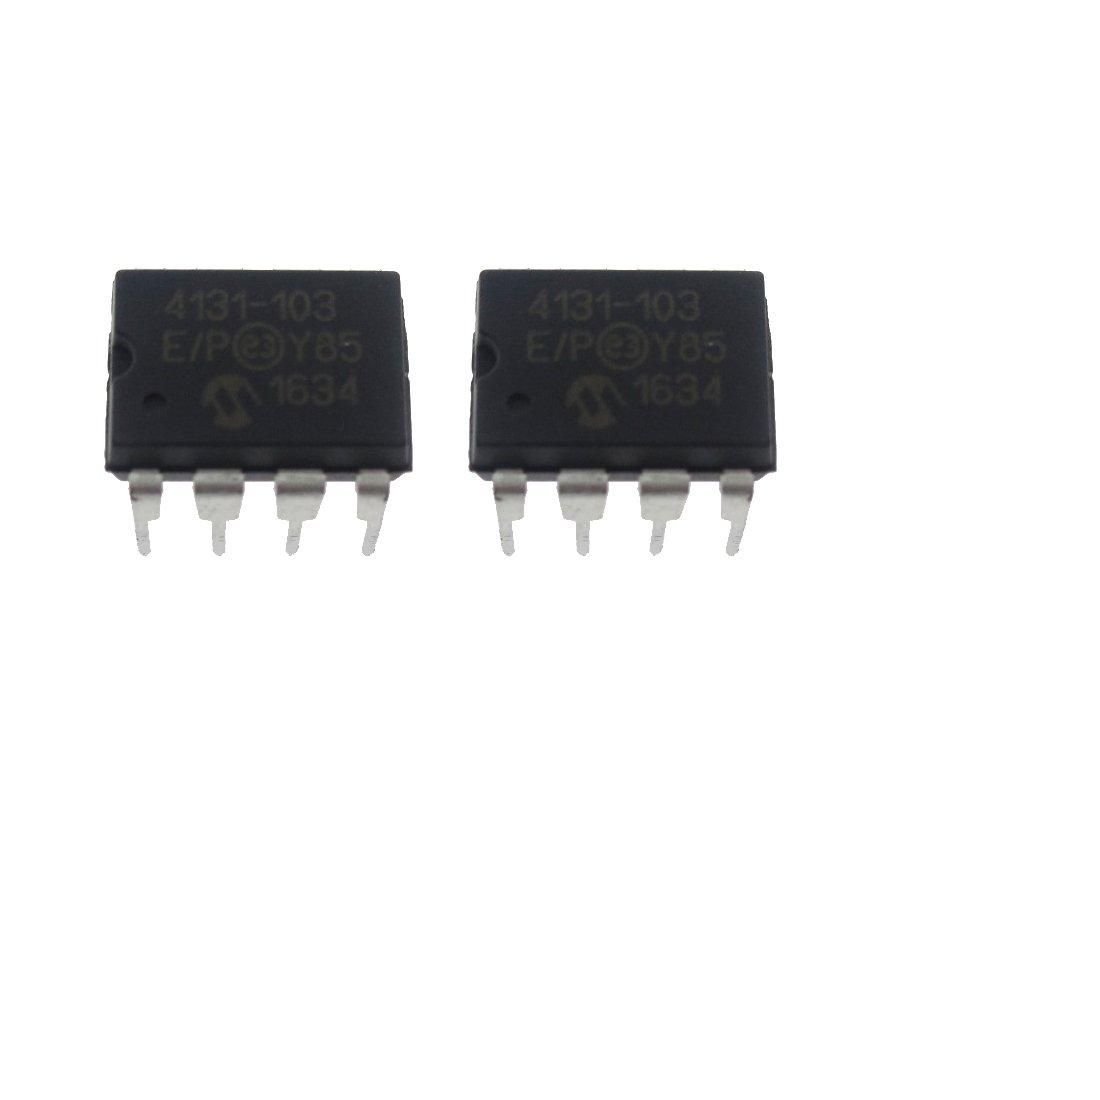 2 Pcs Mcp4131 103e P 10k Ohm Digital How To Build A Potentiometer Circuit Using 129 Steps Single Dip8 Industrial Scientific